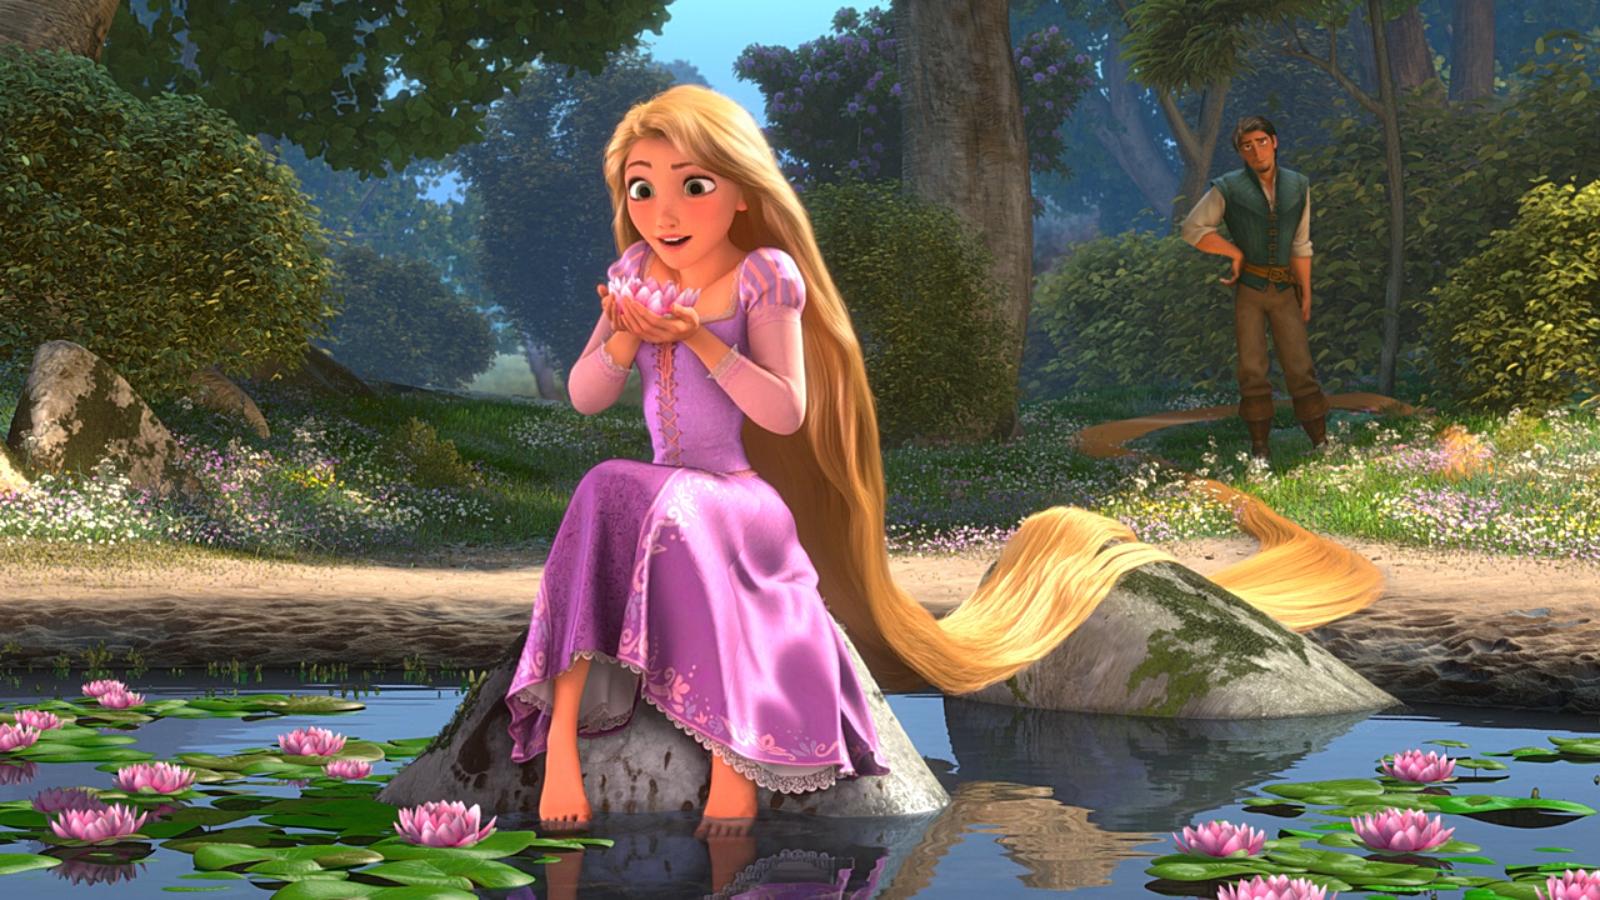 Tangled Rapunzel Wallpaper 1600x900 Tangled Rapunzel 1600x900